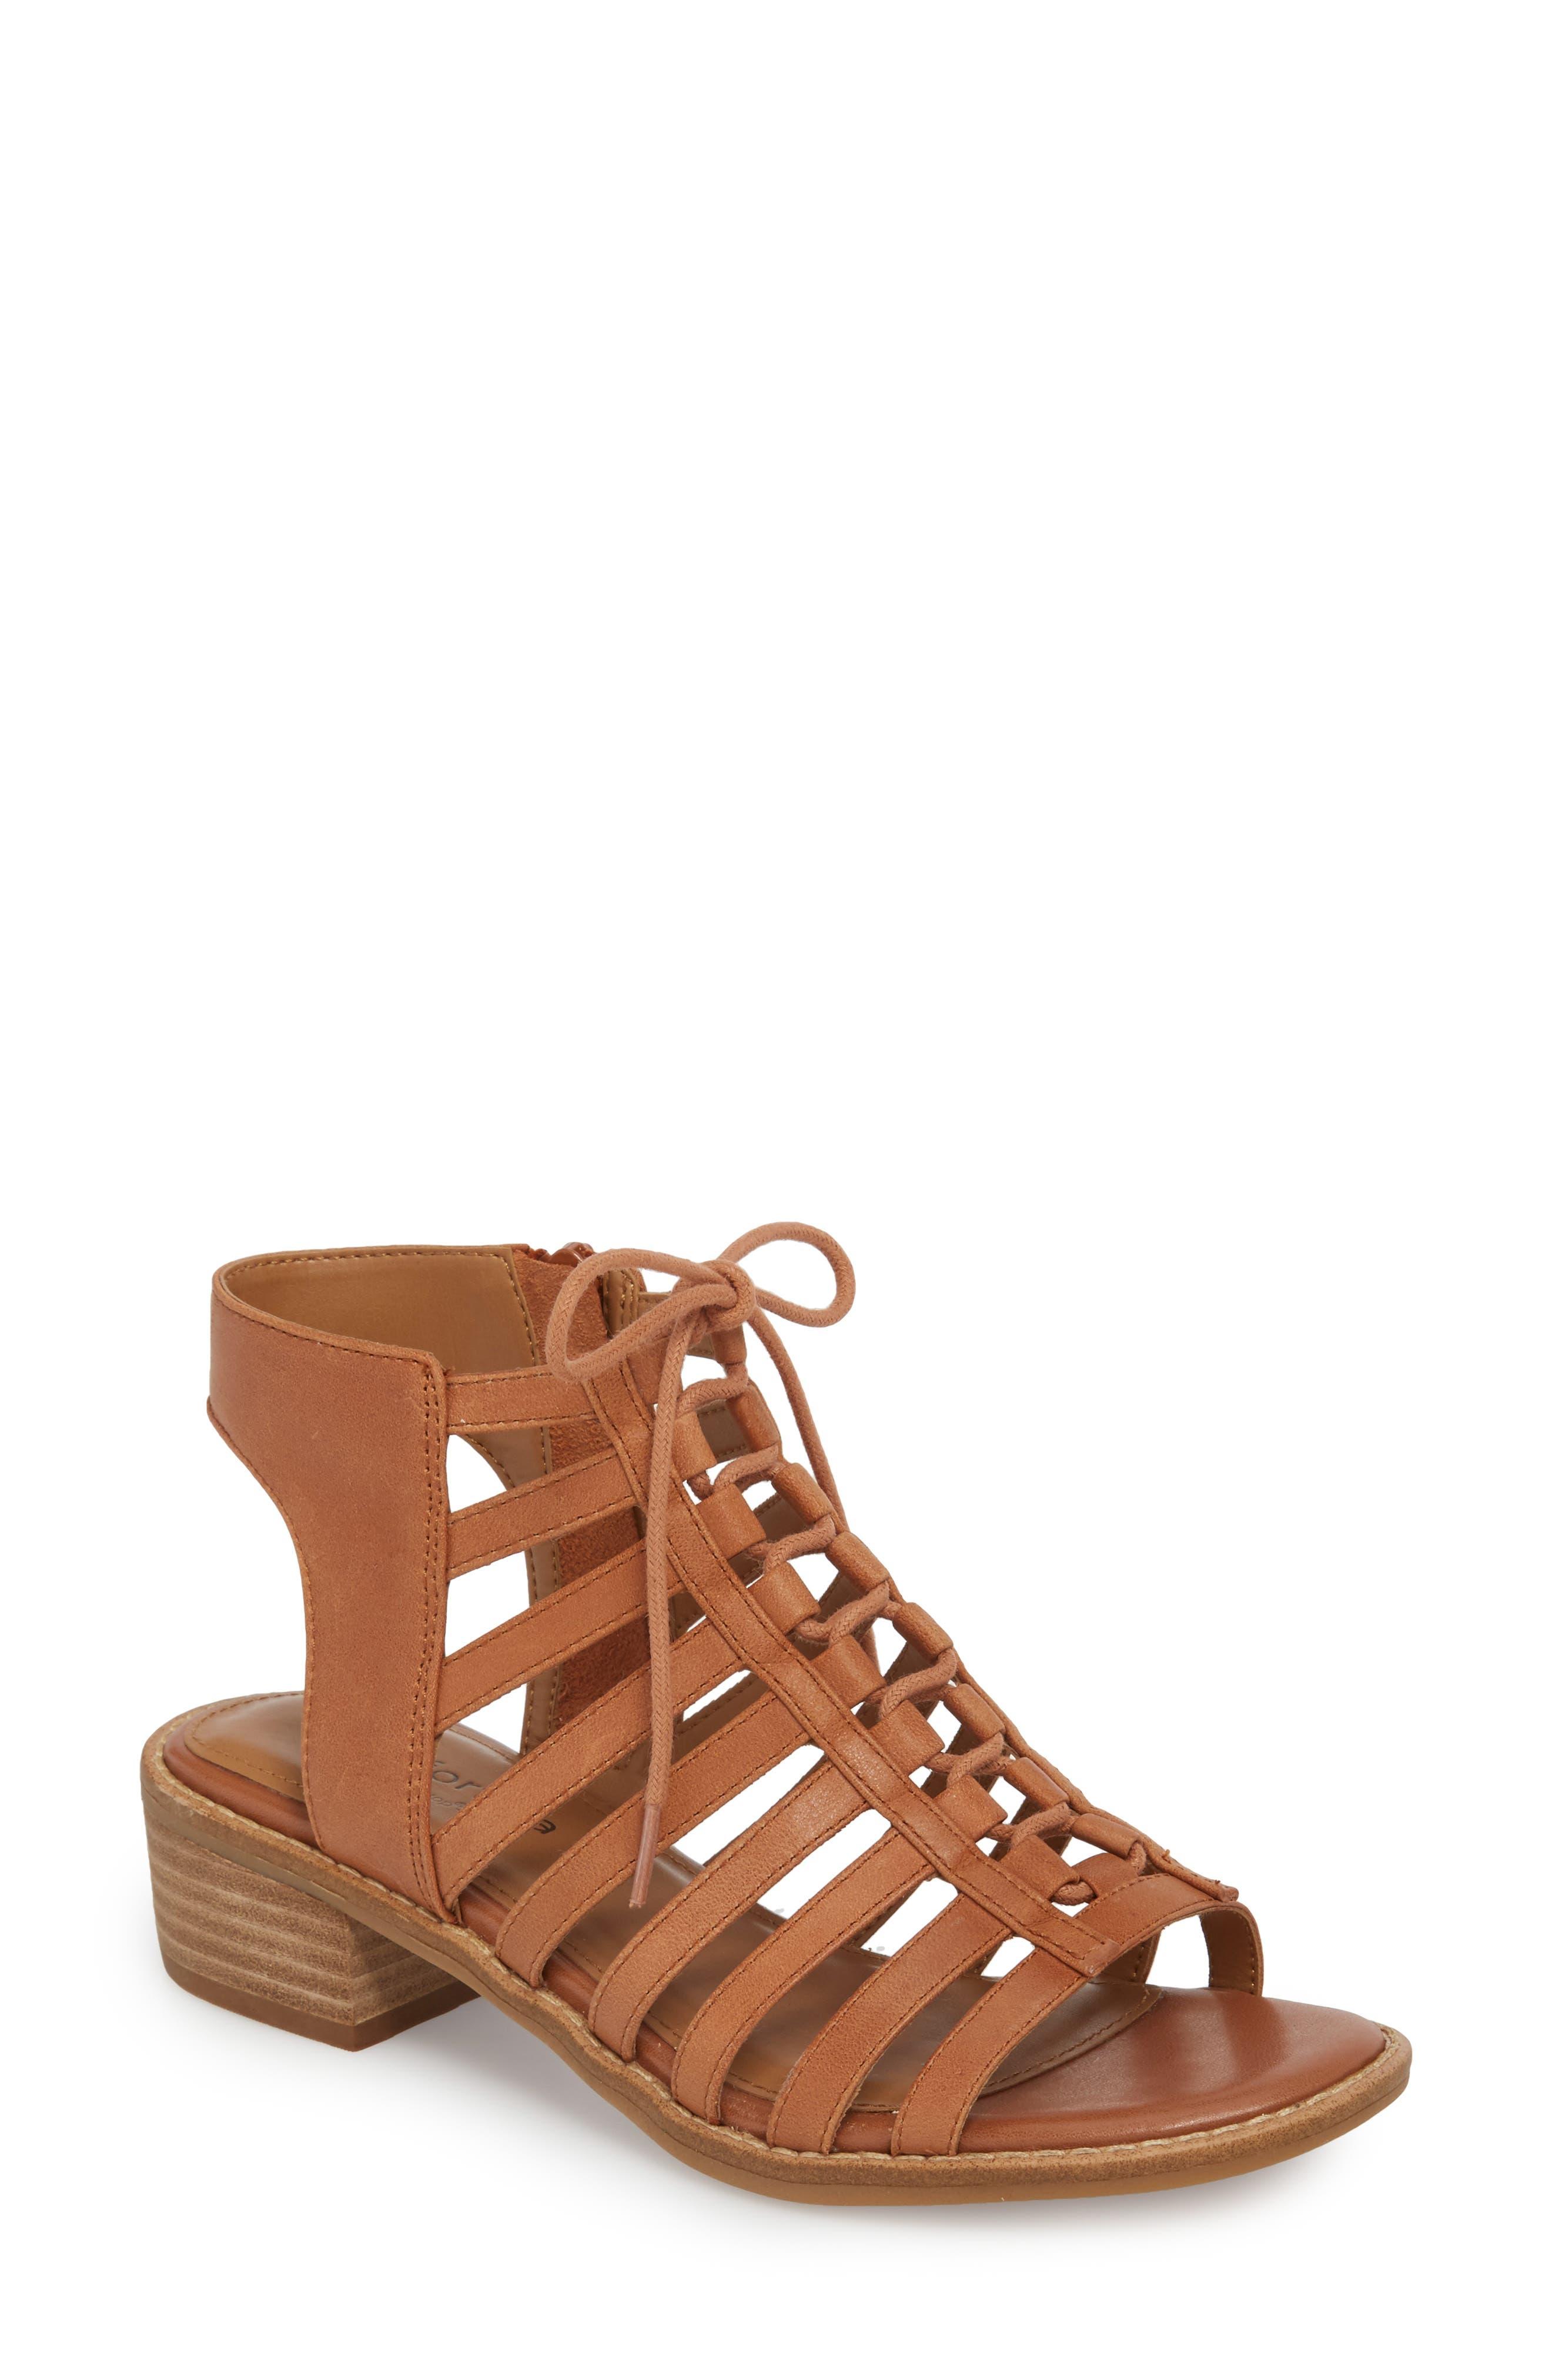 Blossom Sandal,                             Main thumbnail 1, color,                             Walnut Leather